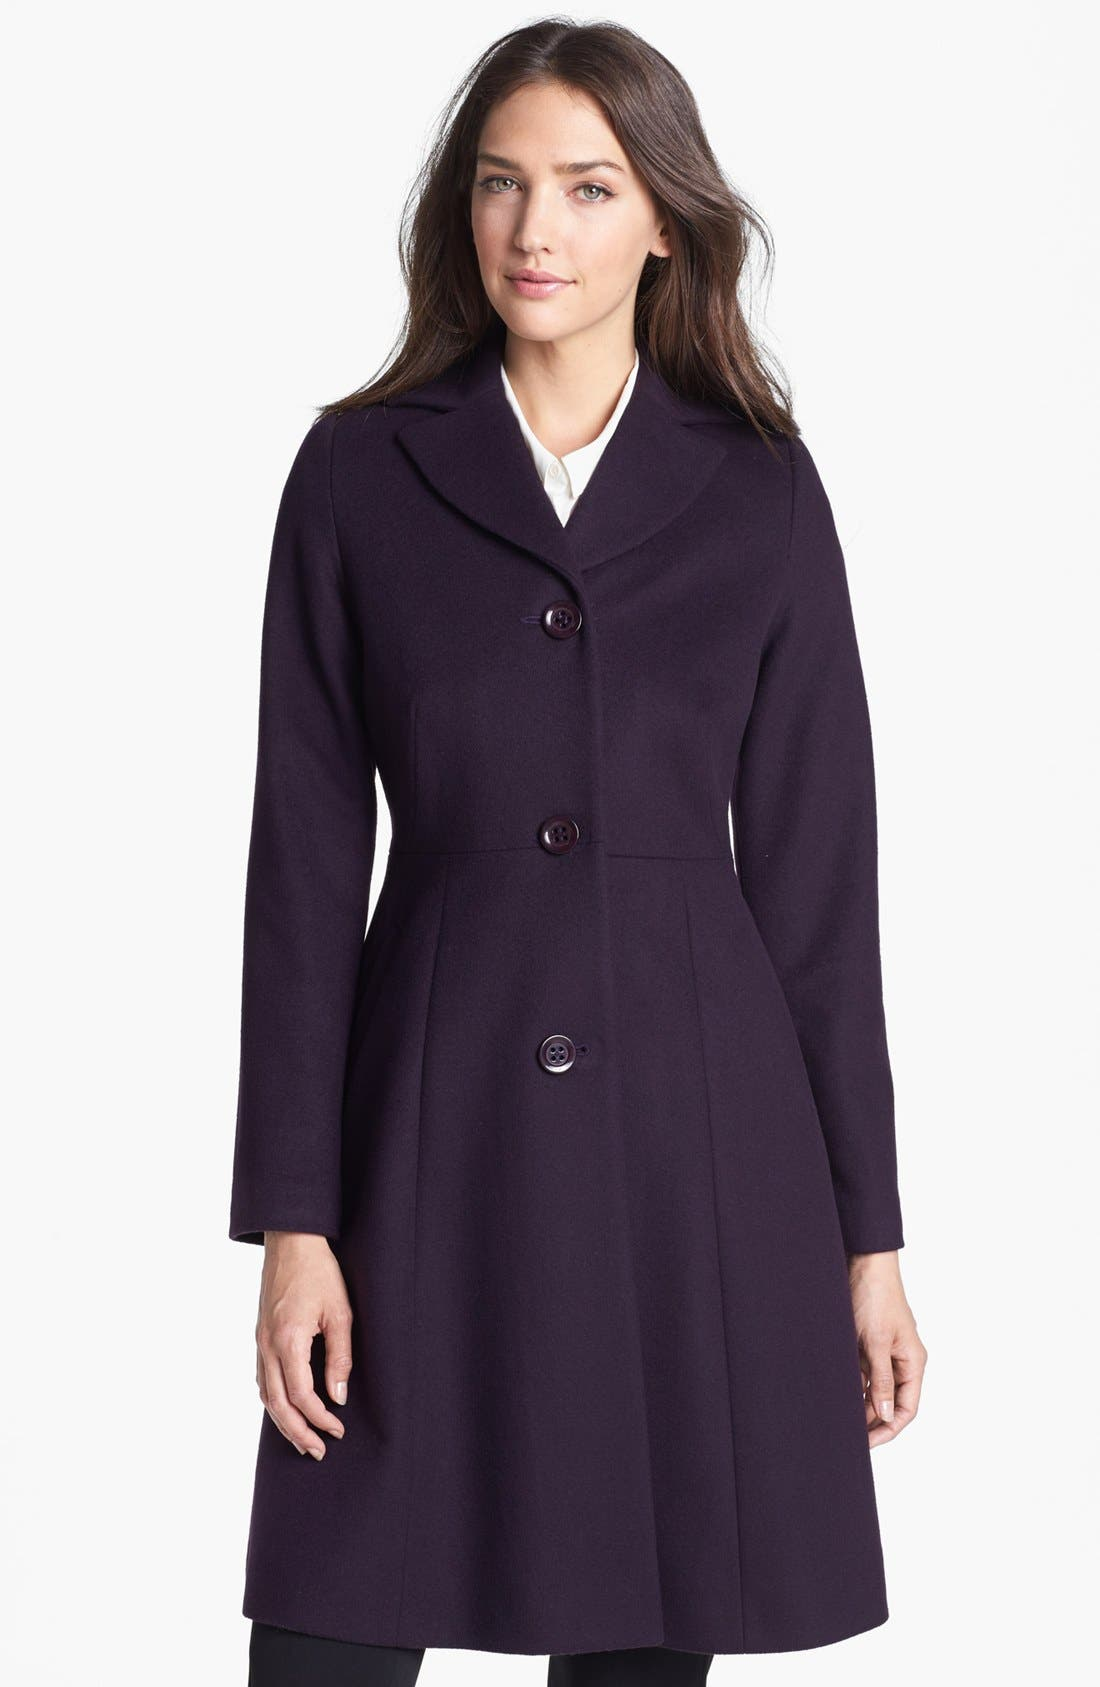 Alternate Image 1 Selected - Kristen Blake Fit & Flare Wool Blend Coat (Nordstrom Exclusive)